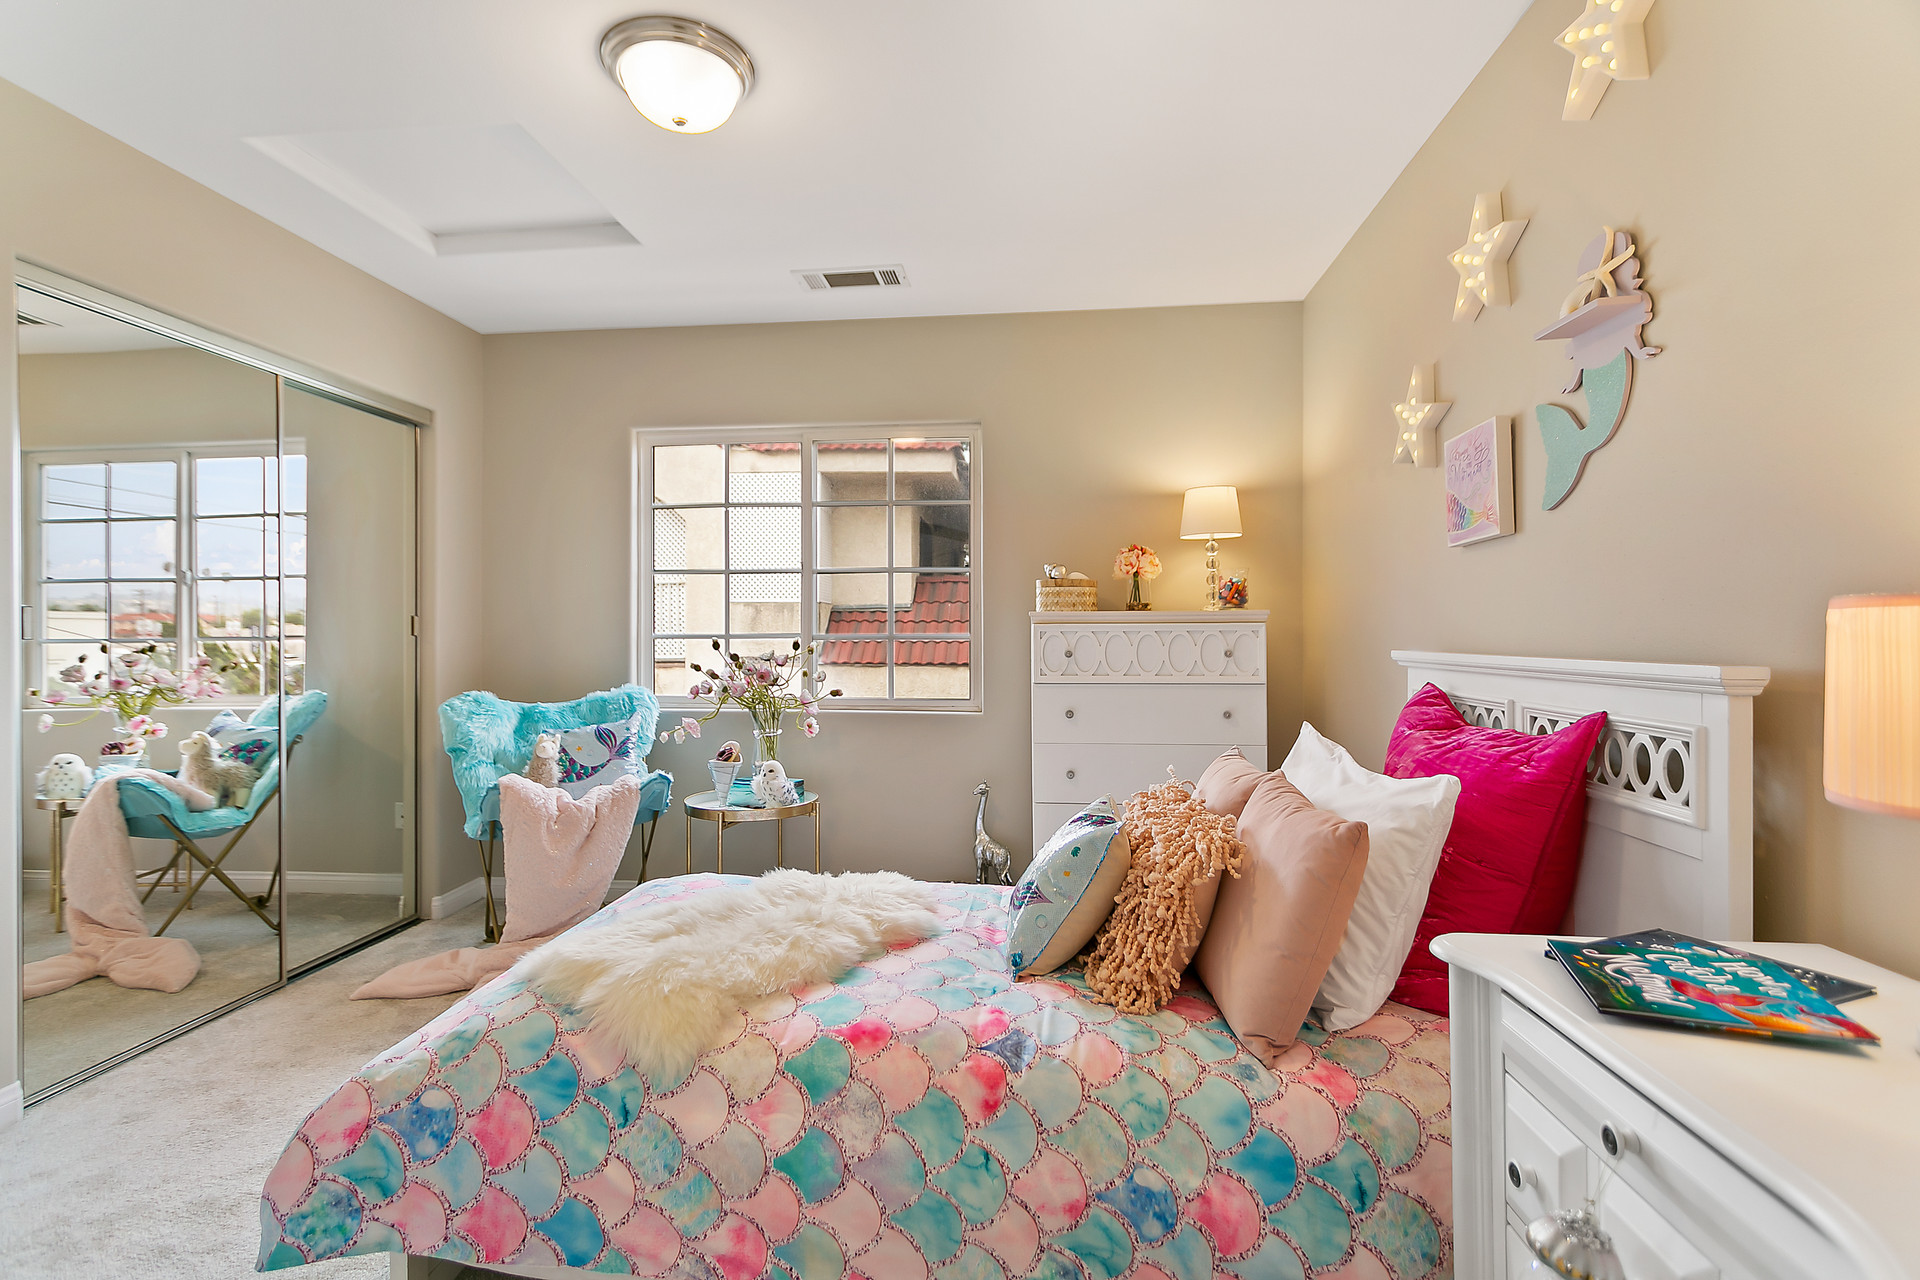 Mermaid Bedroom Decor Cindy Dole Storybo